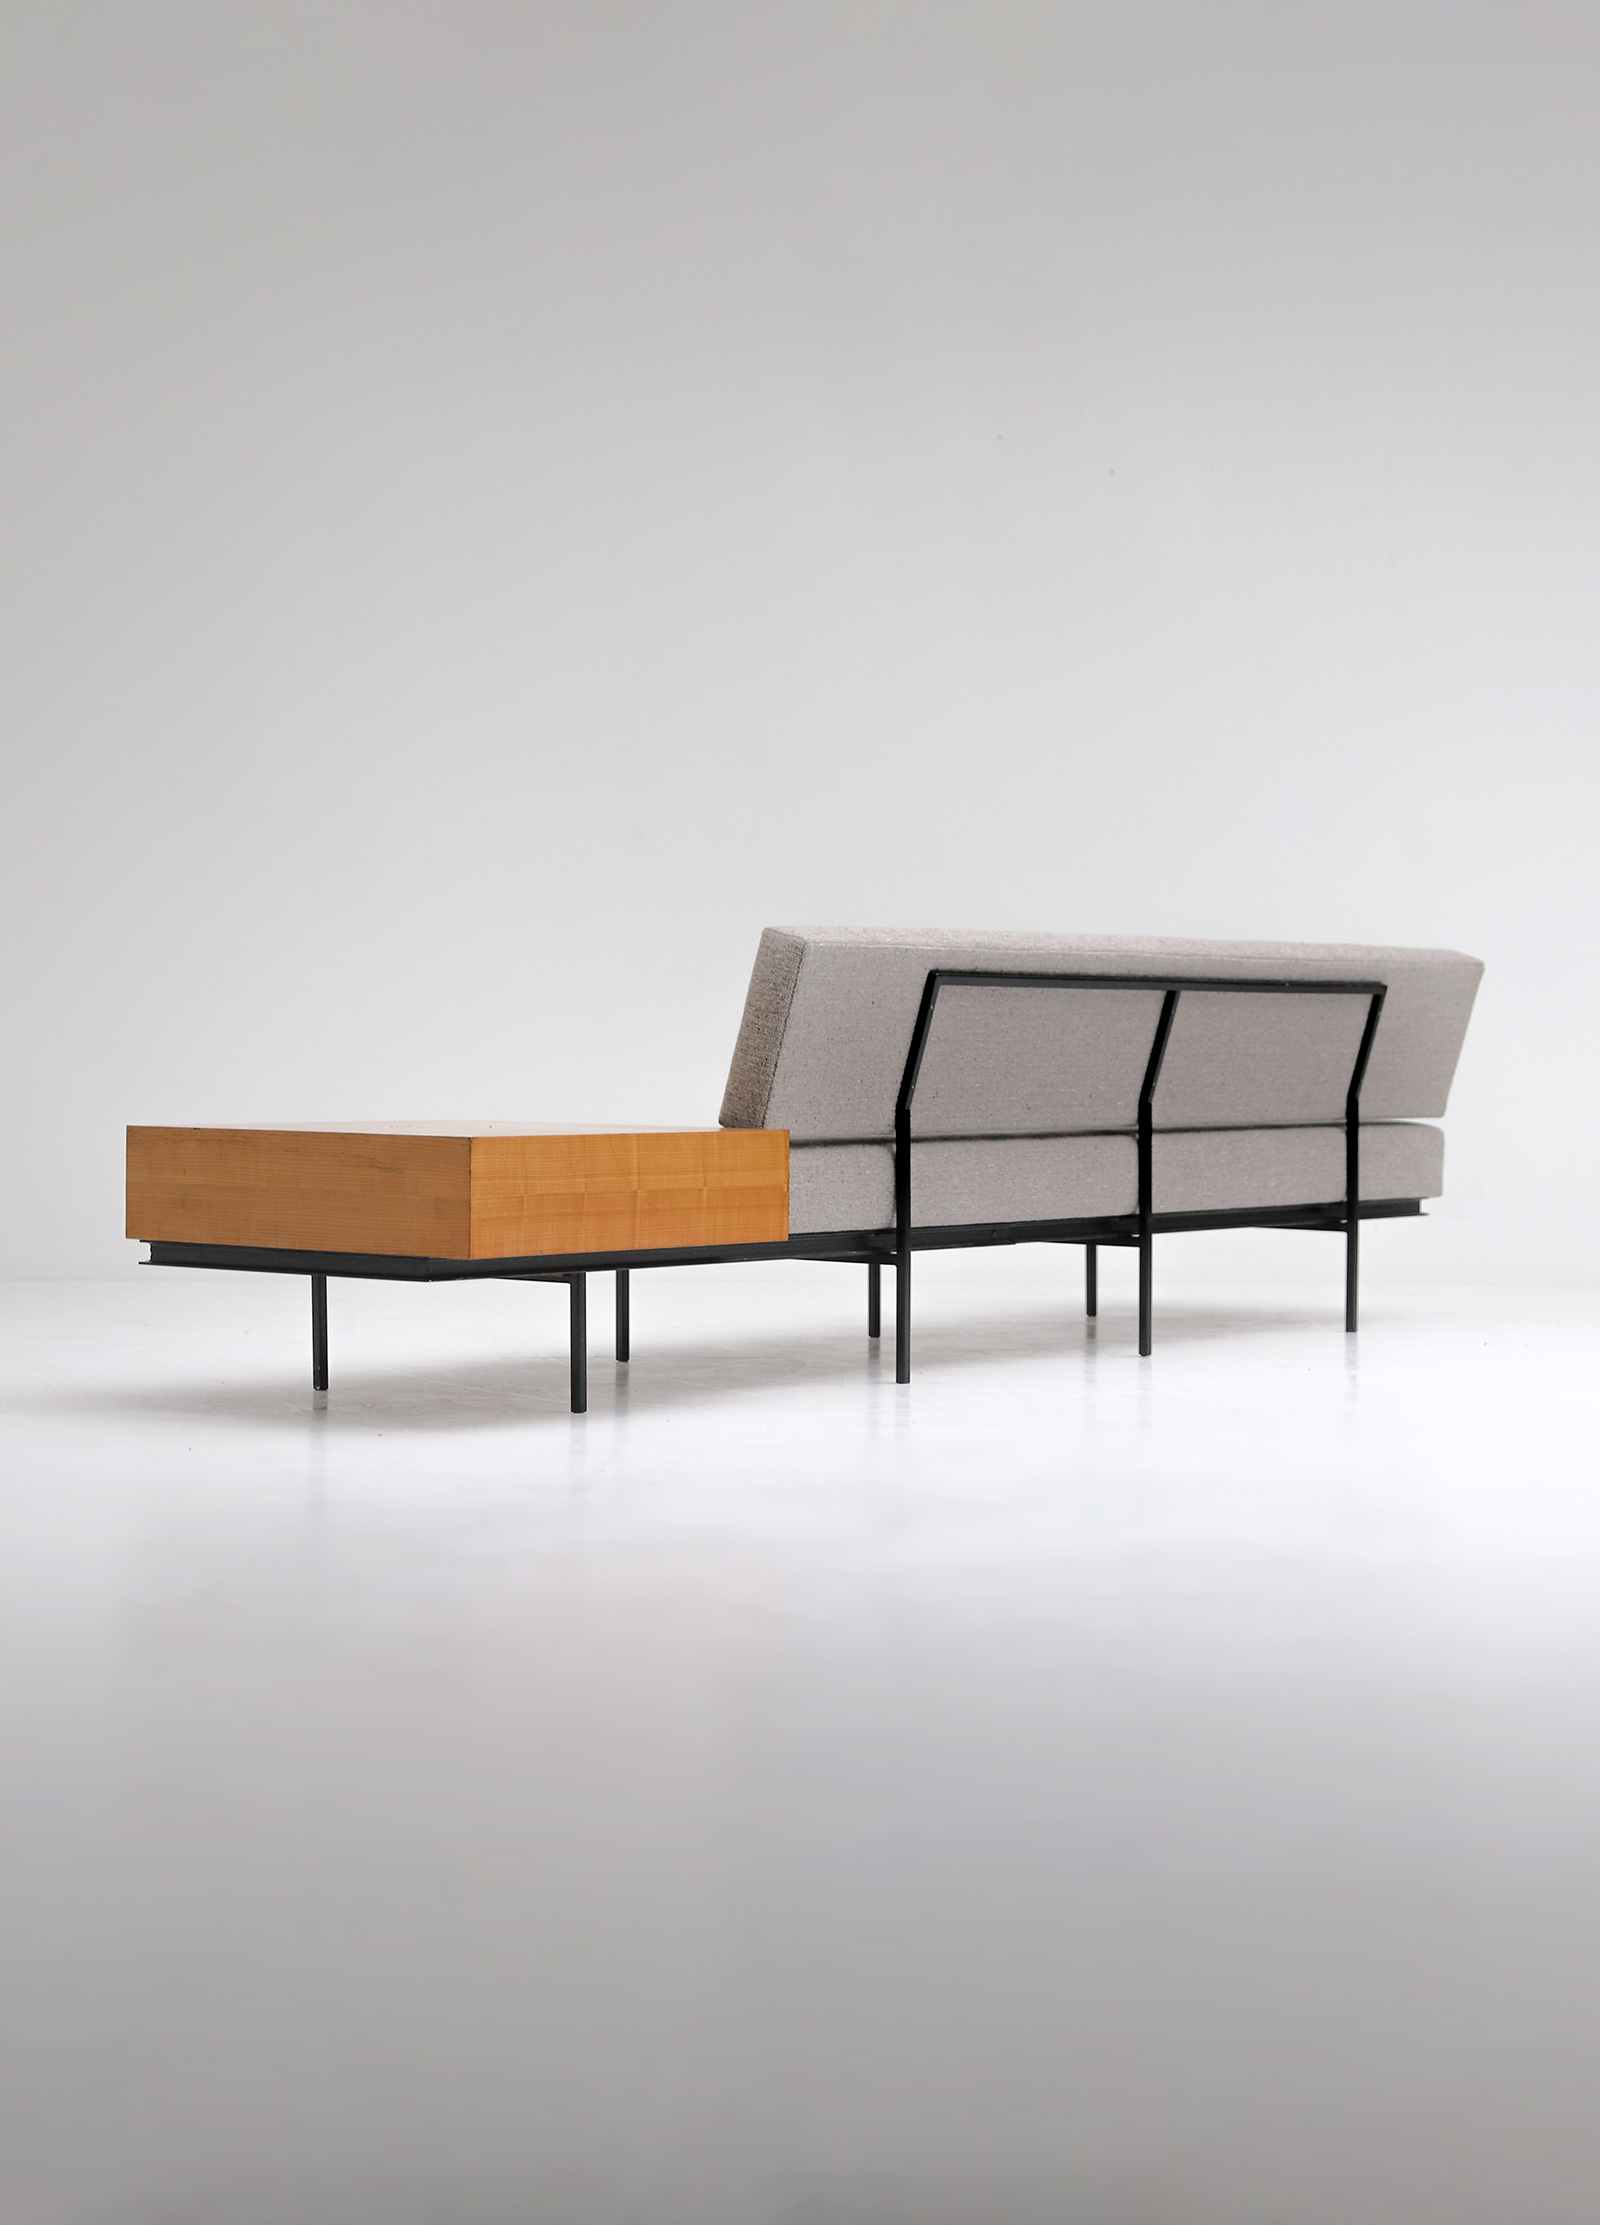 Florence Knoll Sofa & Cabinet image 8